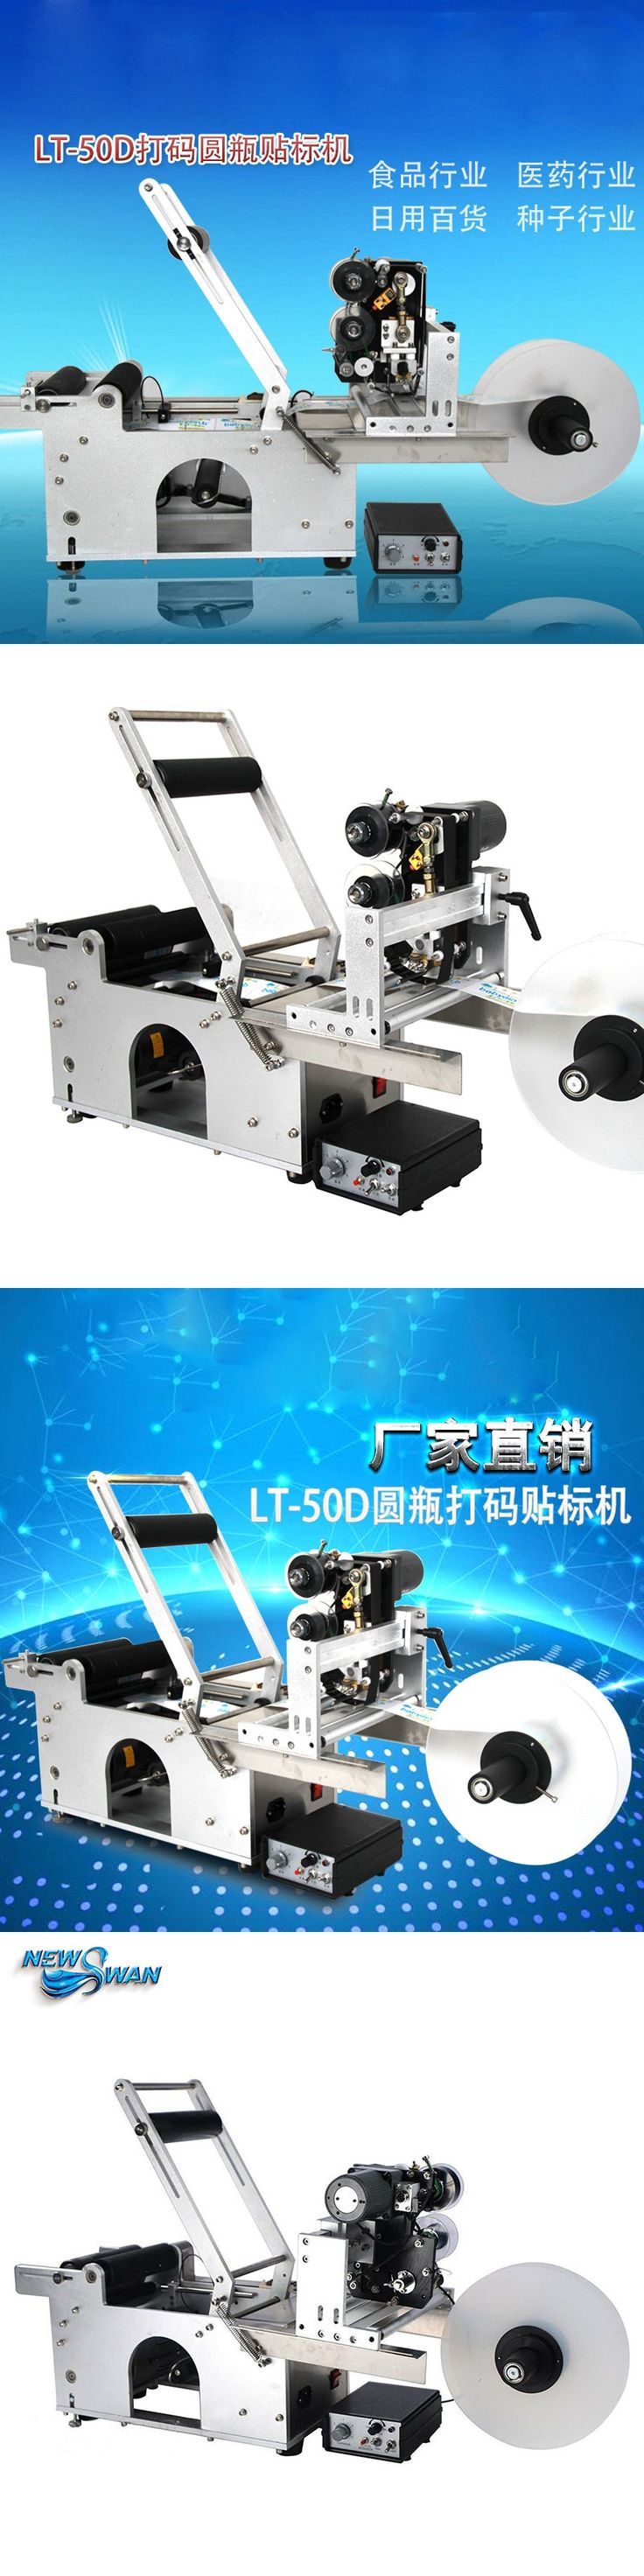 Original LT50D 25mm 150mm Sticker Printer Code The Non-drying Label Printer Semi-automatic Round Bottle Sticker Labeling Machine